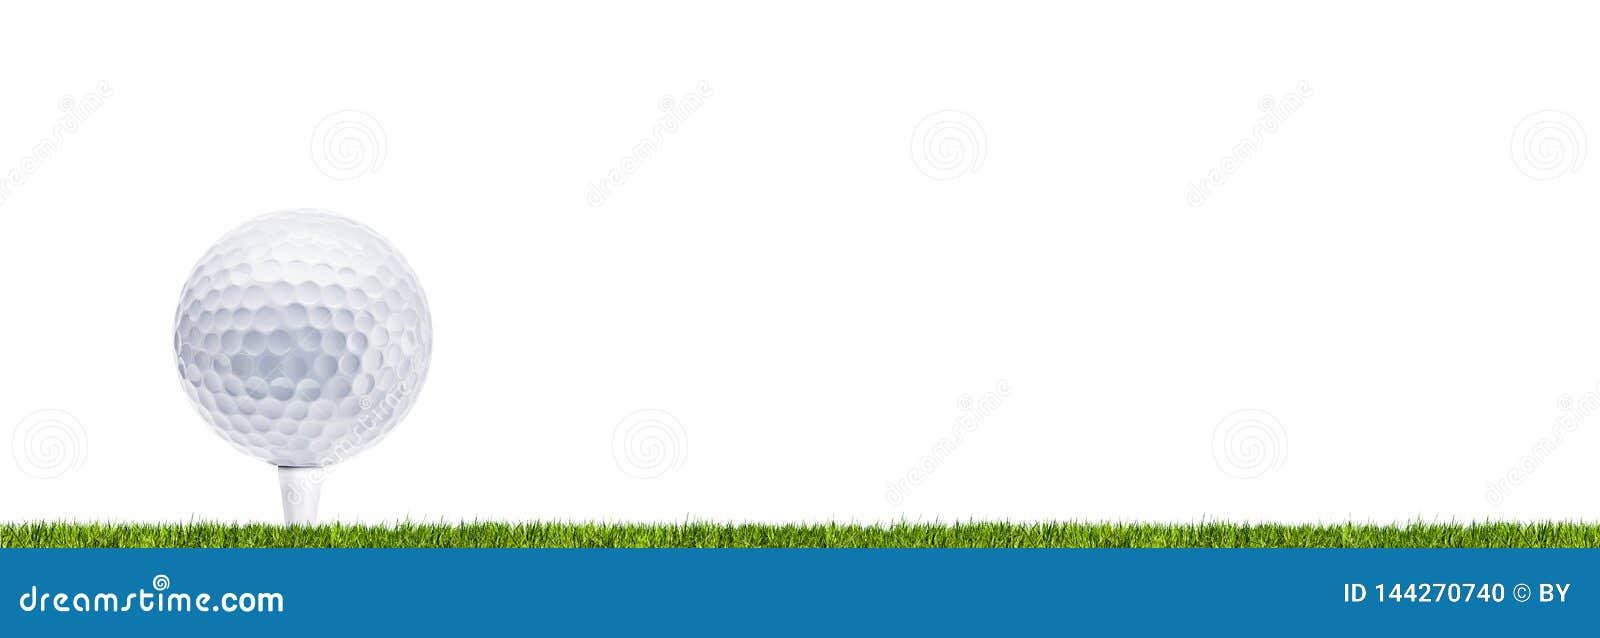 Golf Ball on meadow